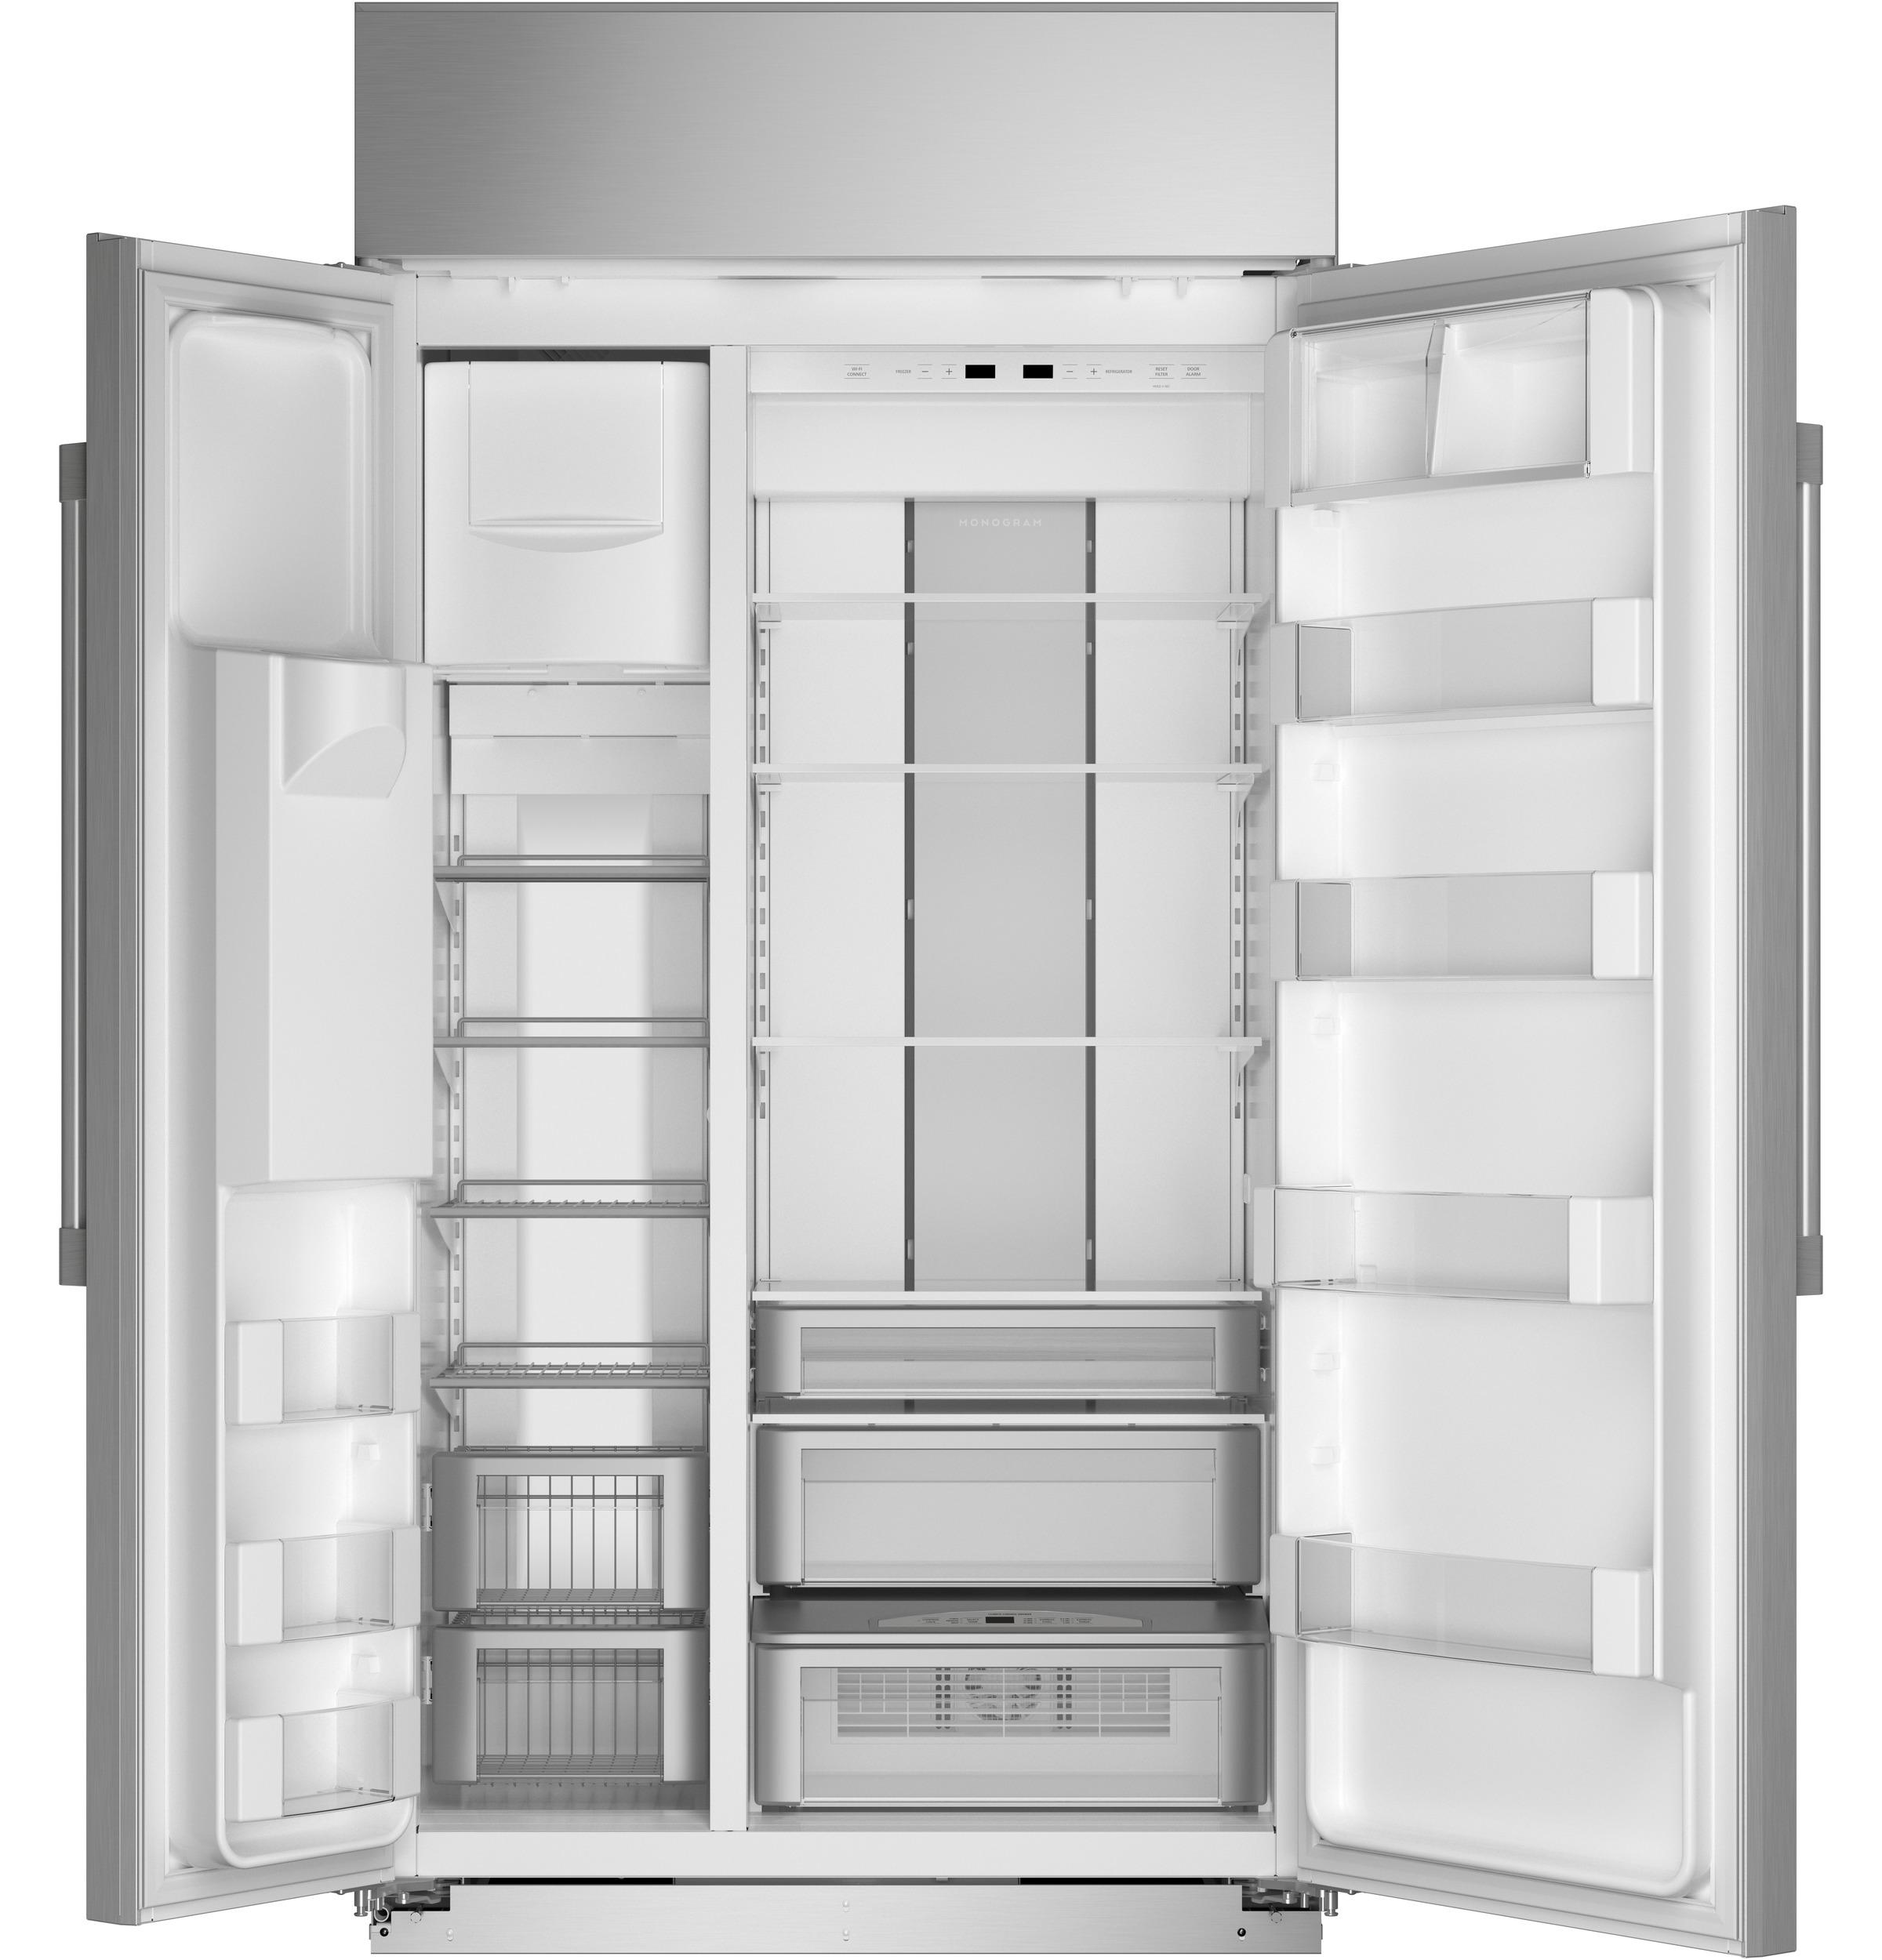 "Model: ZISS420DNSS | Monogram Monogram 42"" Smart Built-In Side-by-Side Refrigerator with Dispenser"